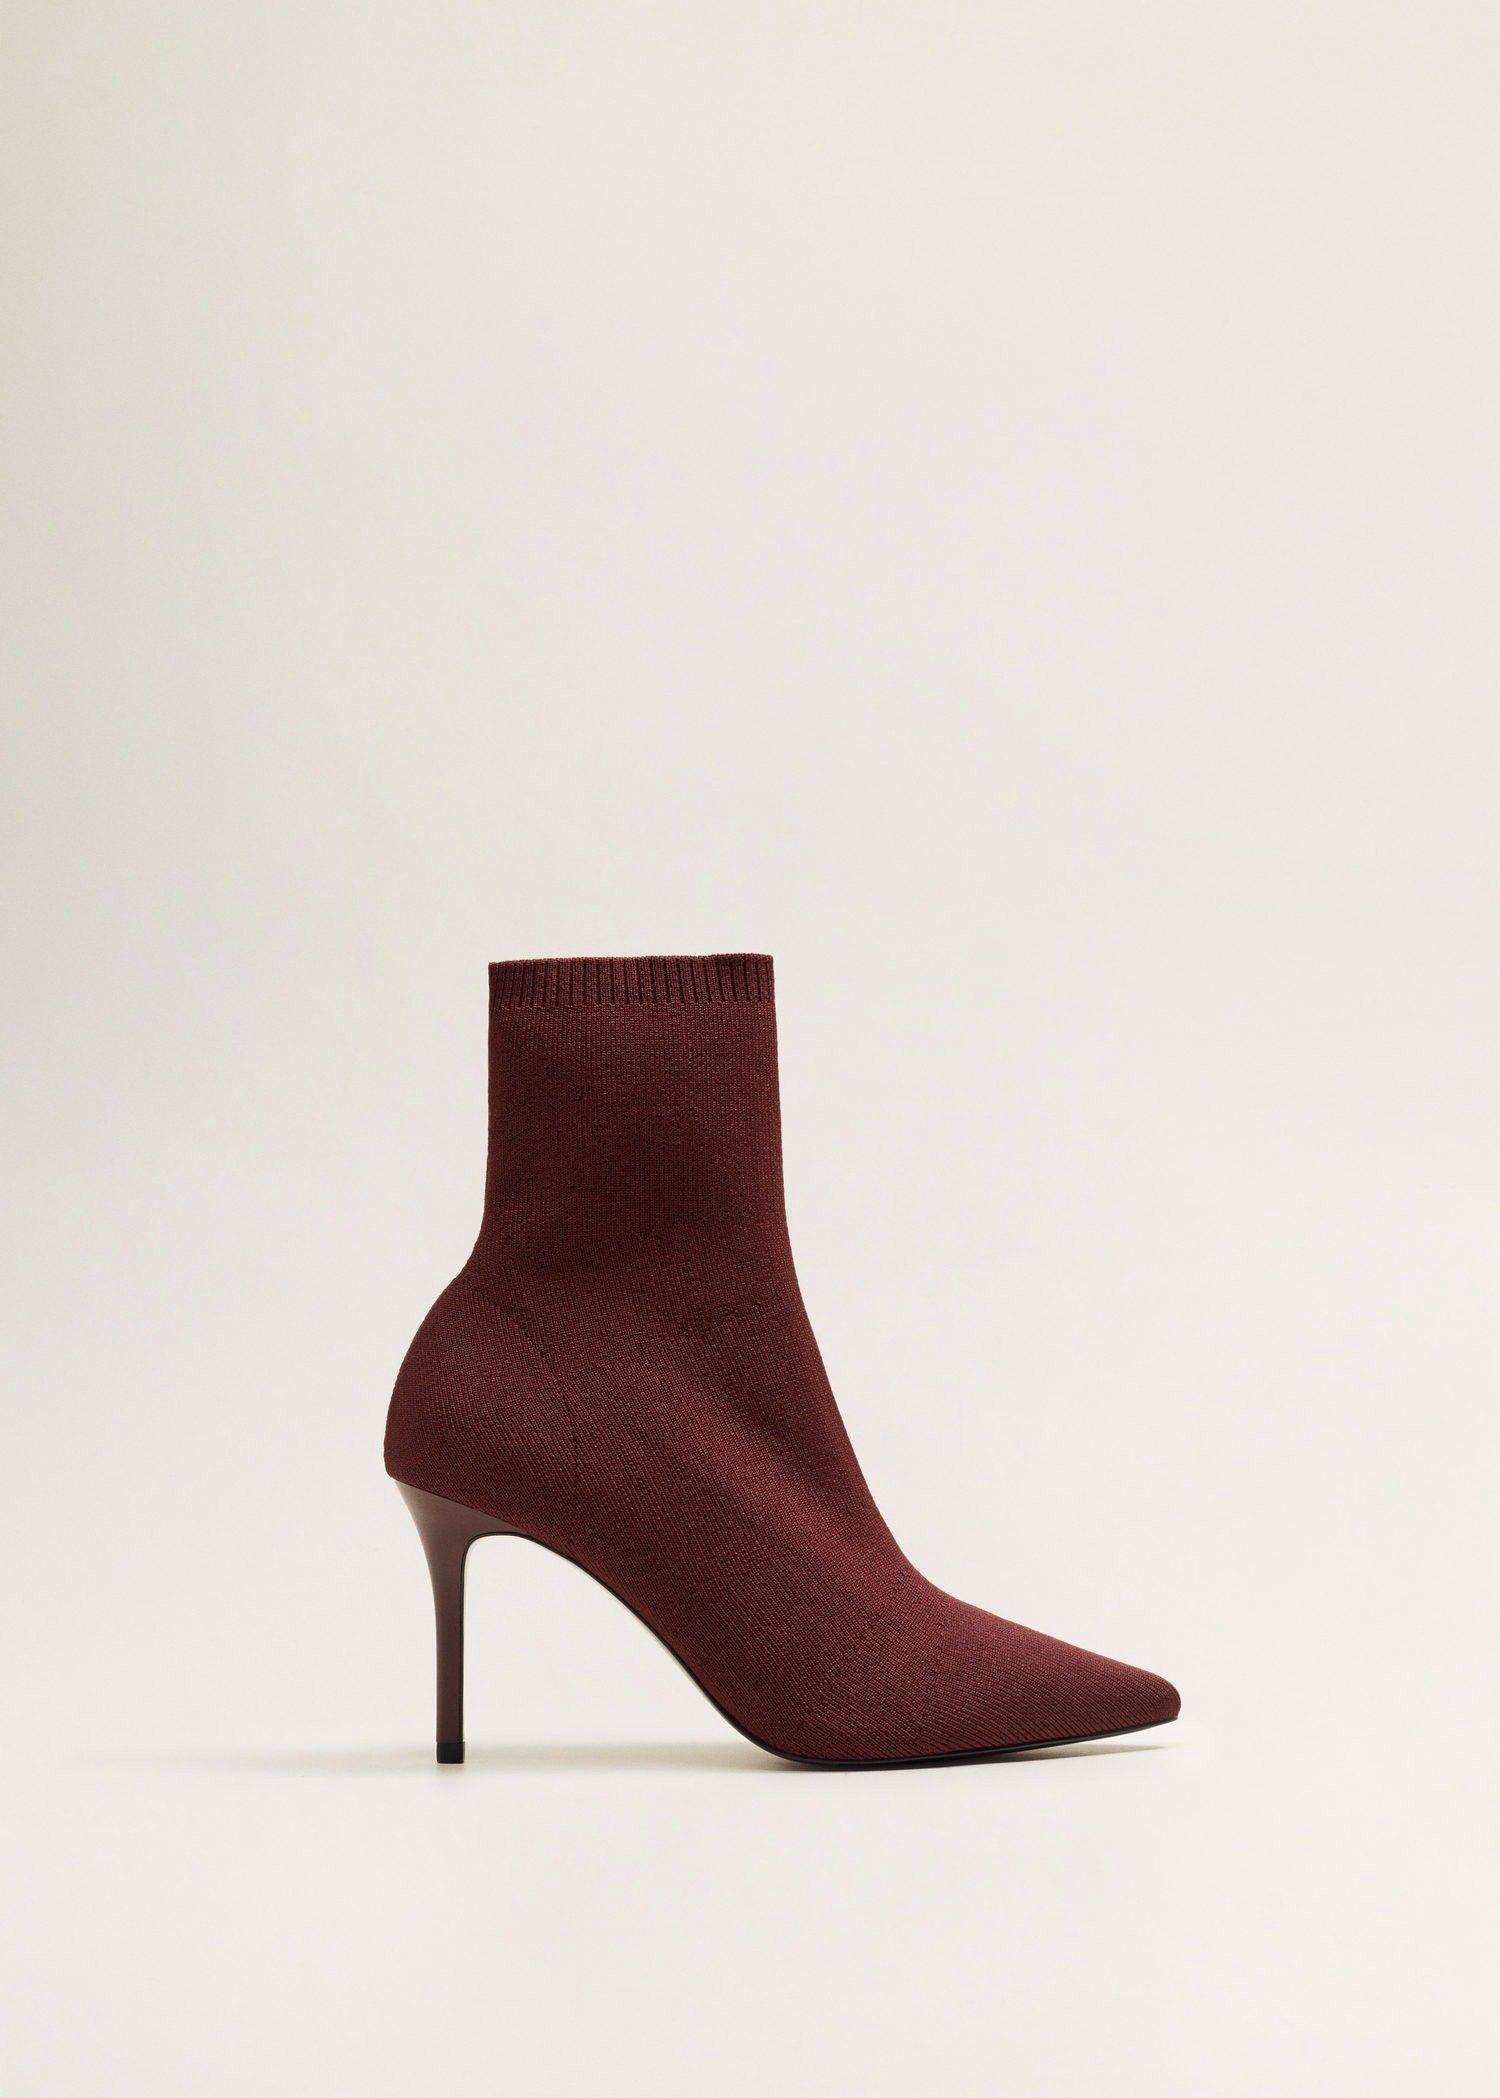 ad6be4157c2 Mango Heel Sock Boots - Wine 6 | Fall/Winter Styles | Socks, heels ...